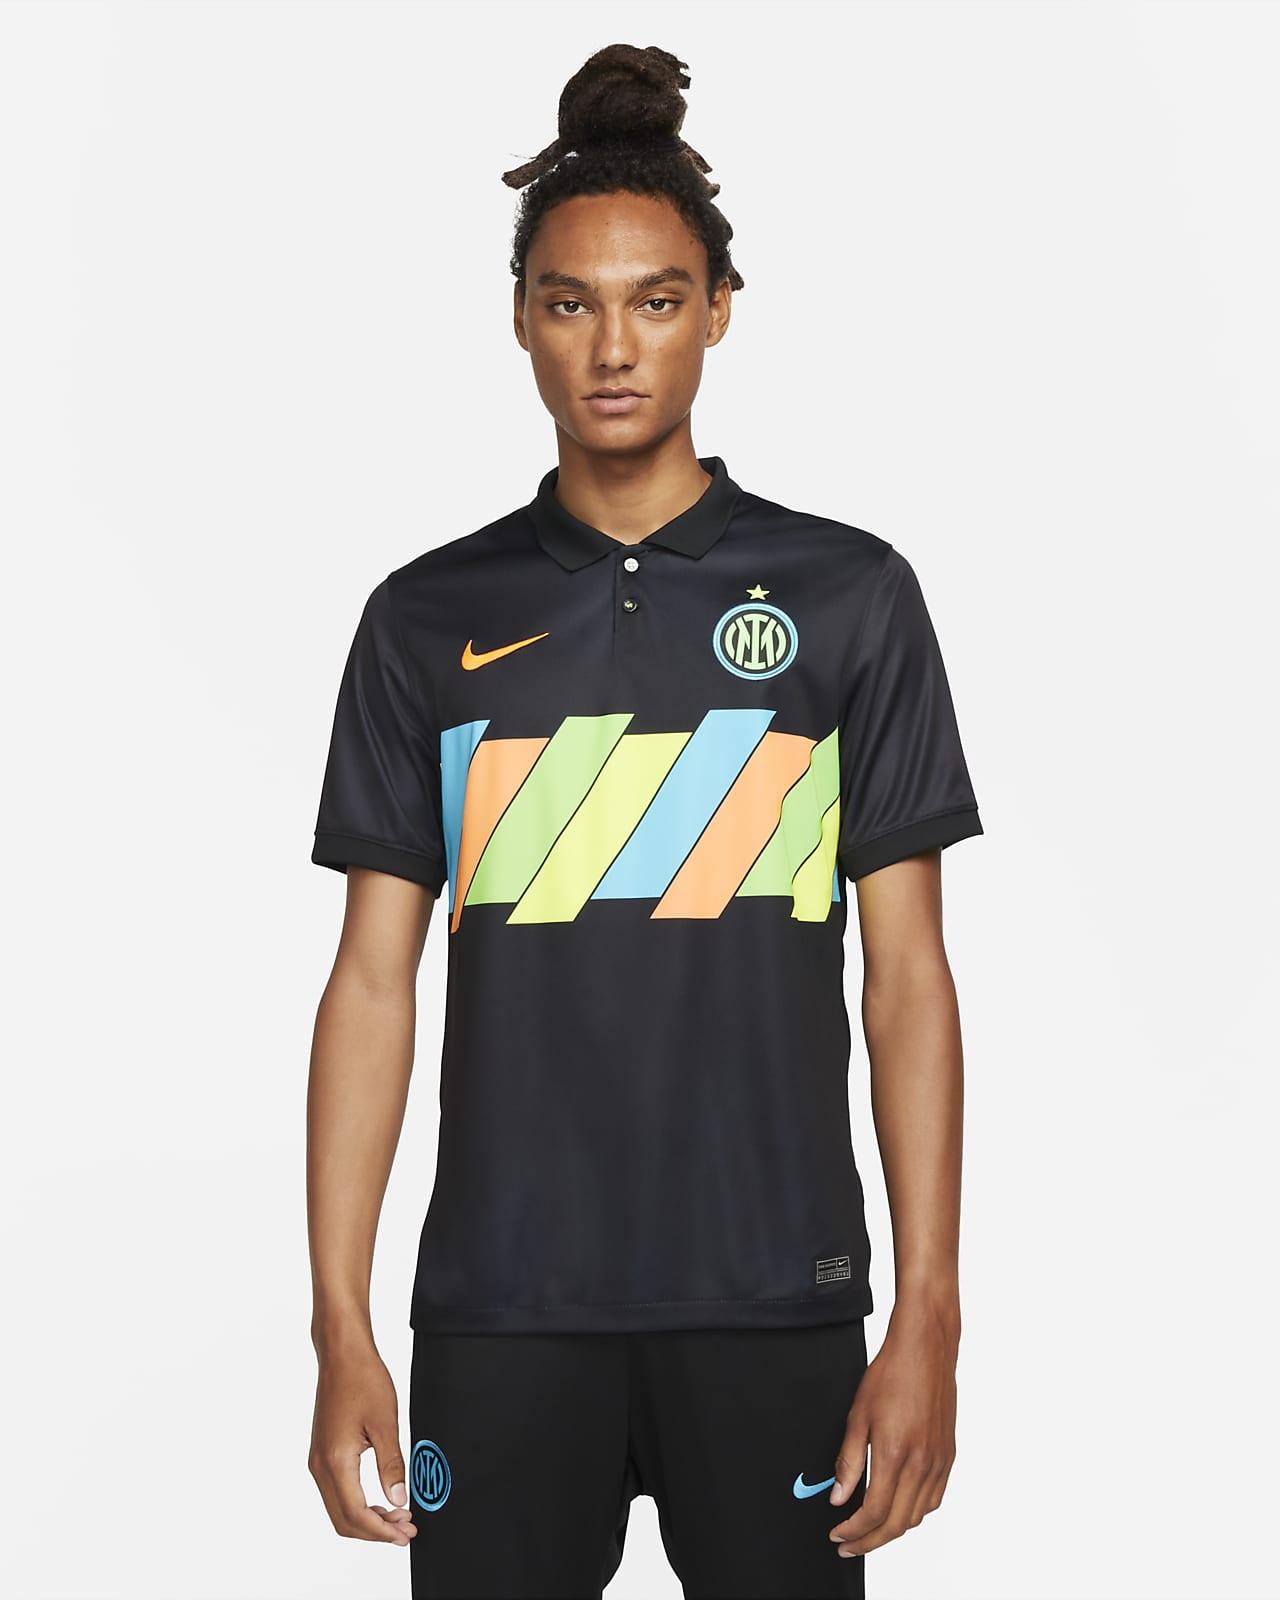 Maillot de football Nike Dri-FIT Inter Milan2021/22 Stadium Third pour Homme